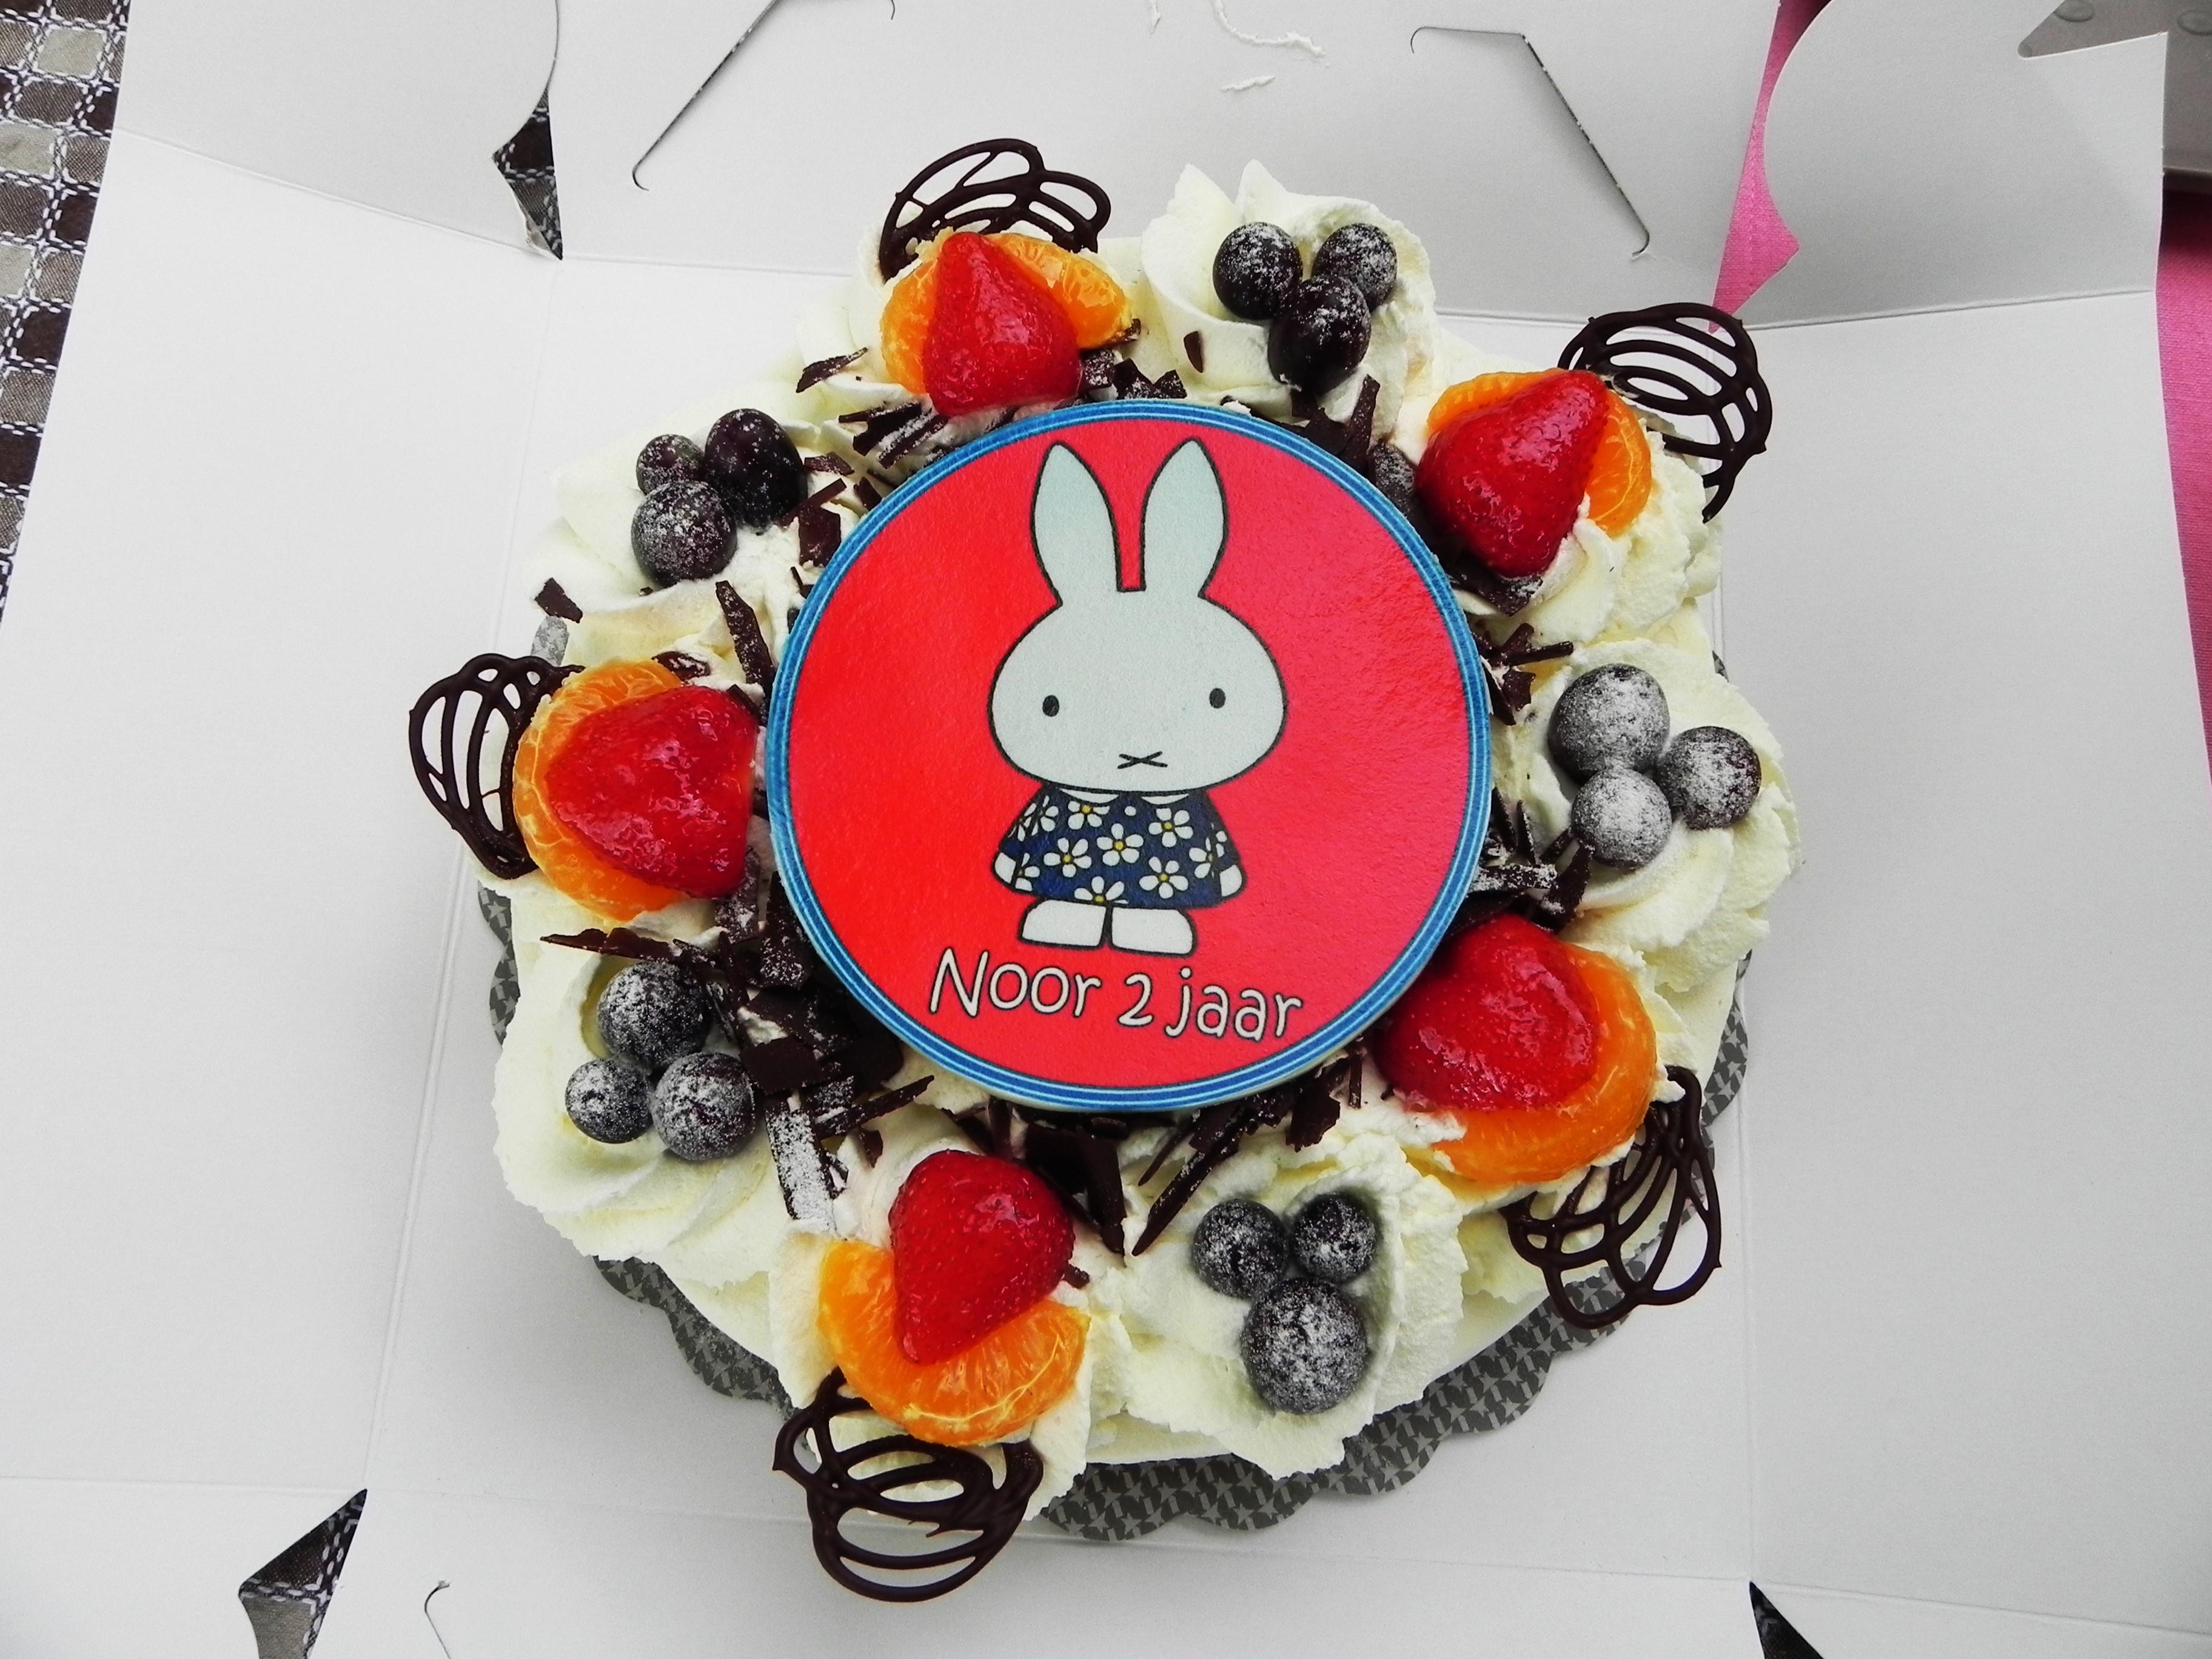 peuter, verjaardag, kind twee jaar, traktatie peuter, mamablog, lifestyle blog, La Log